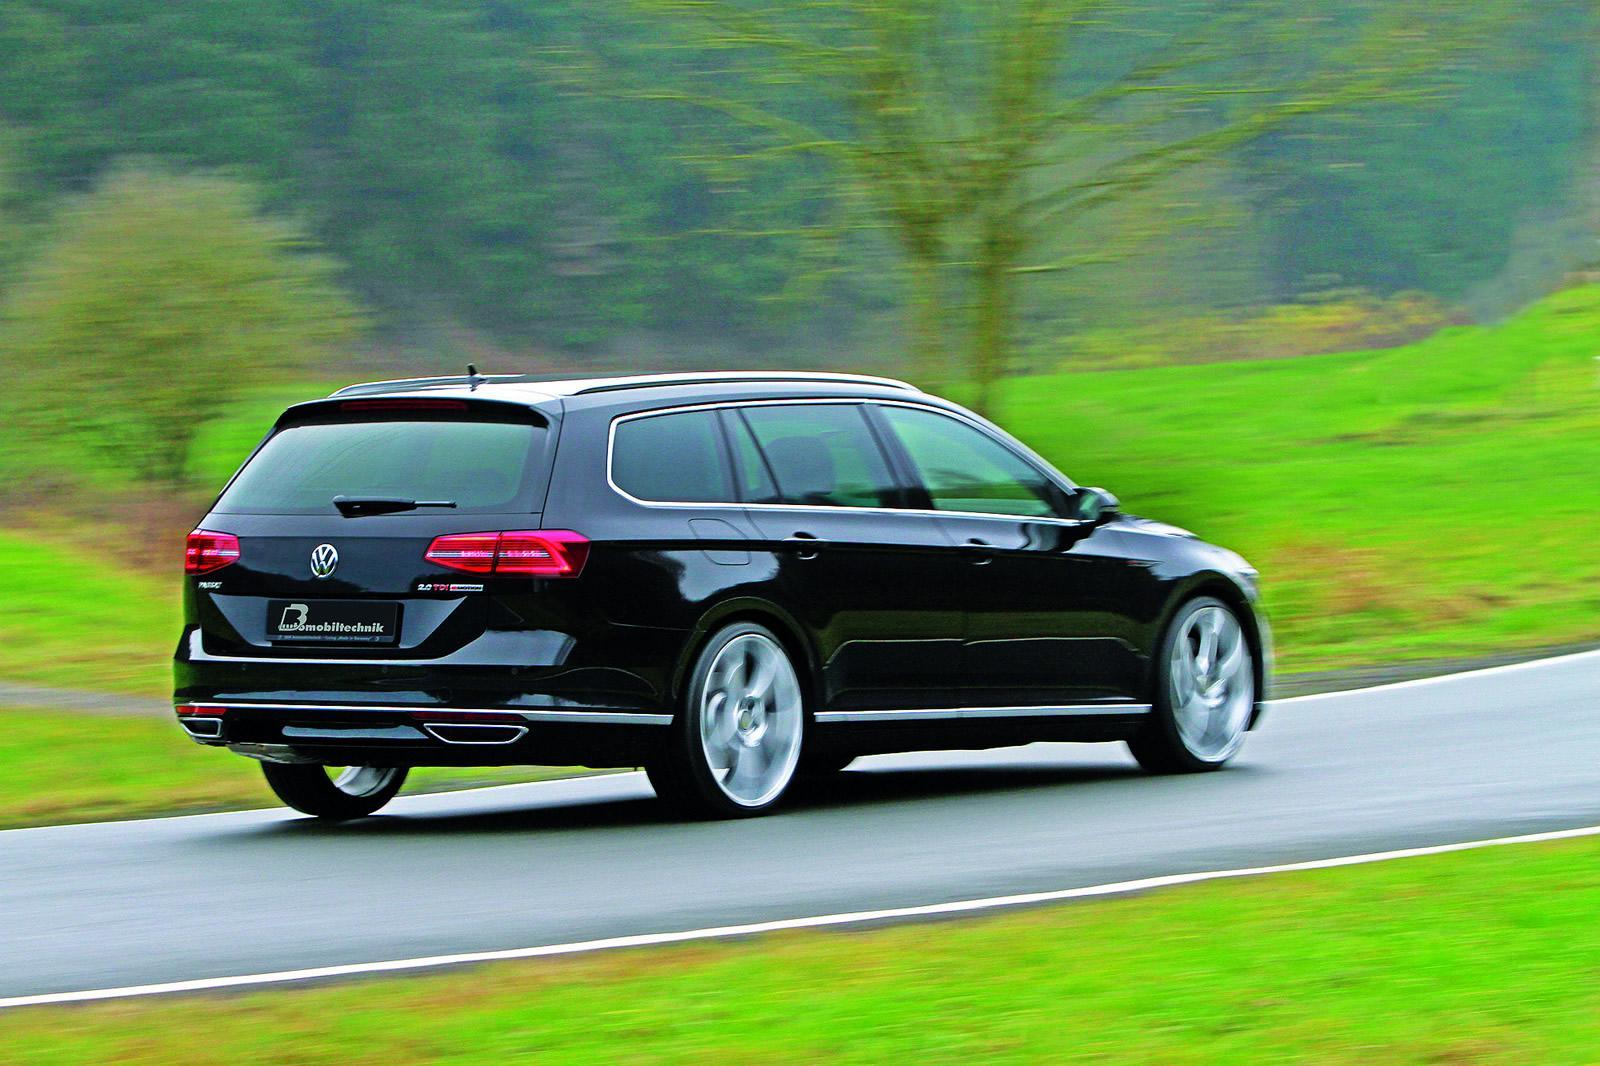 2015 Volkswagen Passat 2 0 Bitdi Tuned To 300 Hp B8 Torque Monster Autoevolution